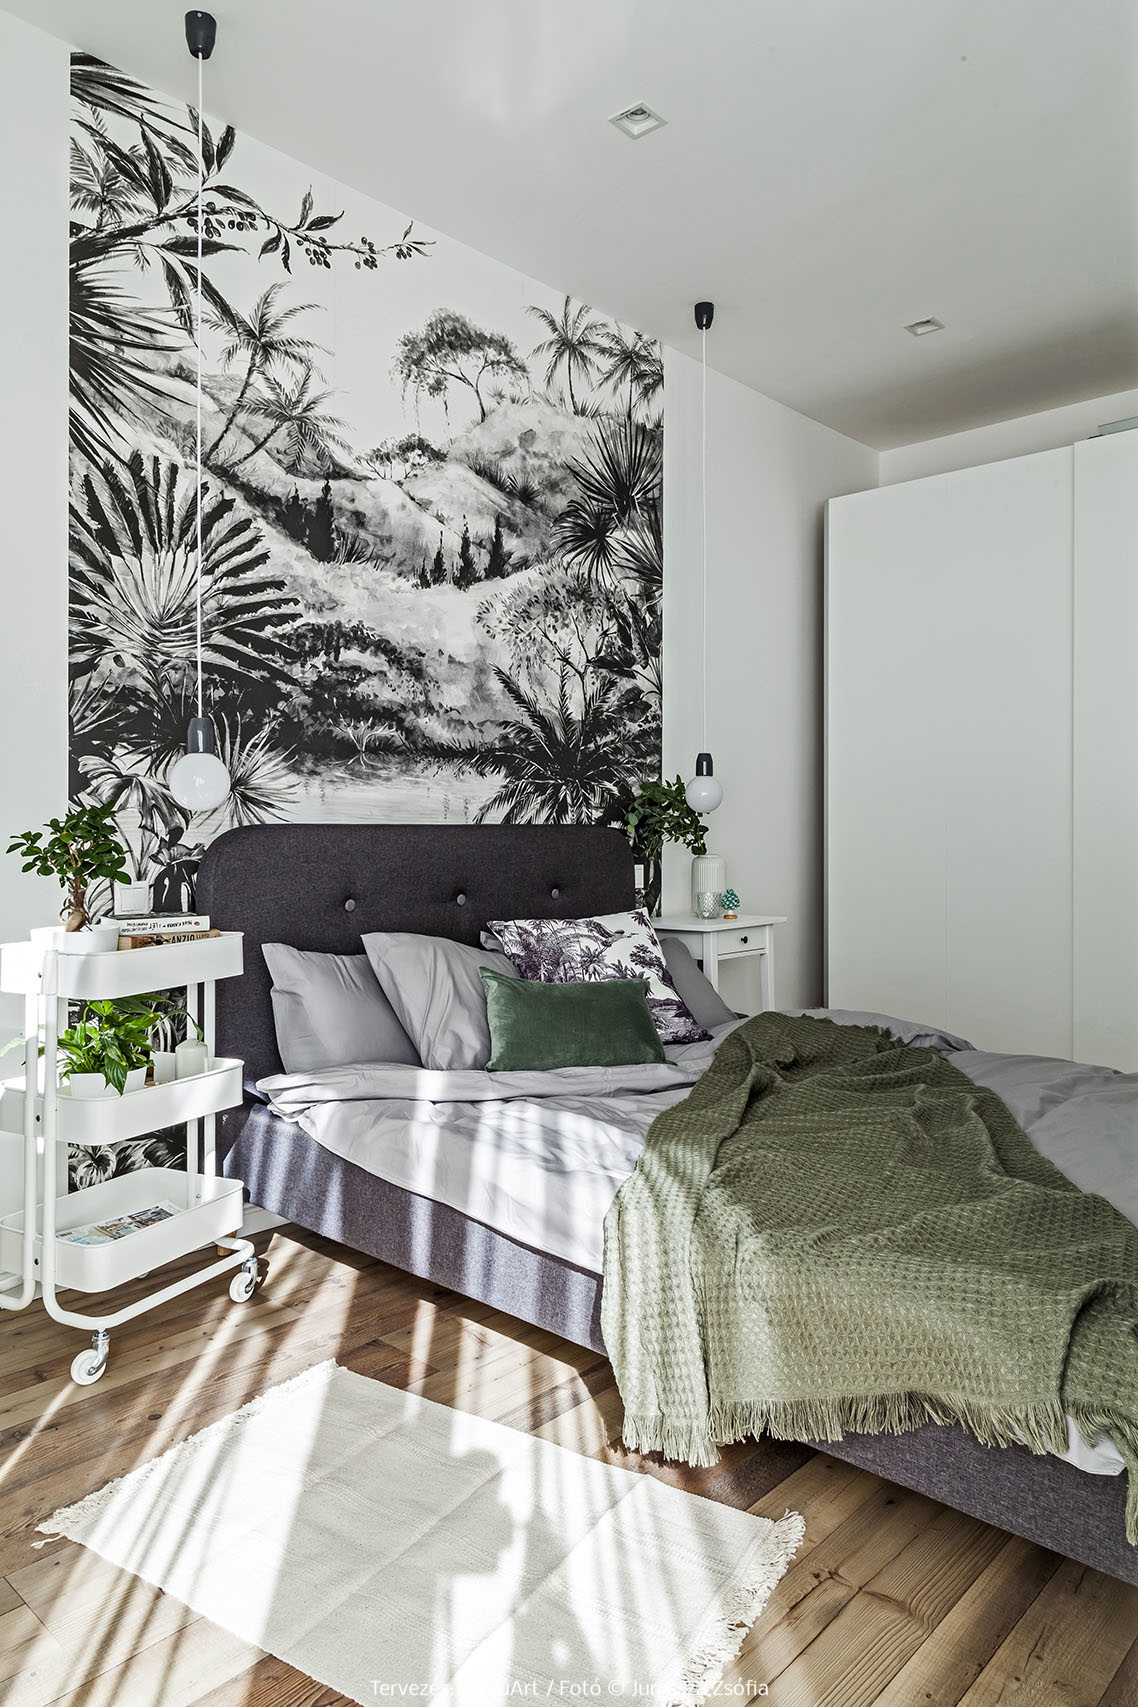 A dzsungel stílus otthonunkban